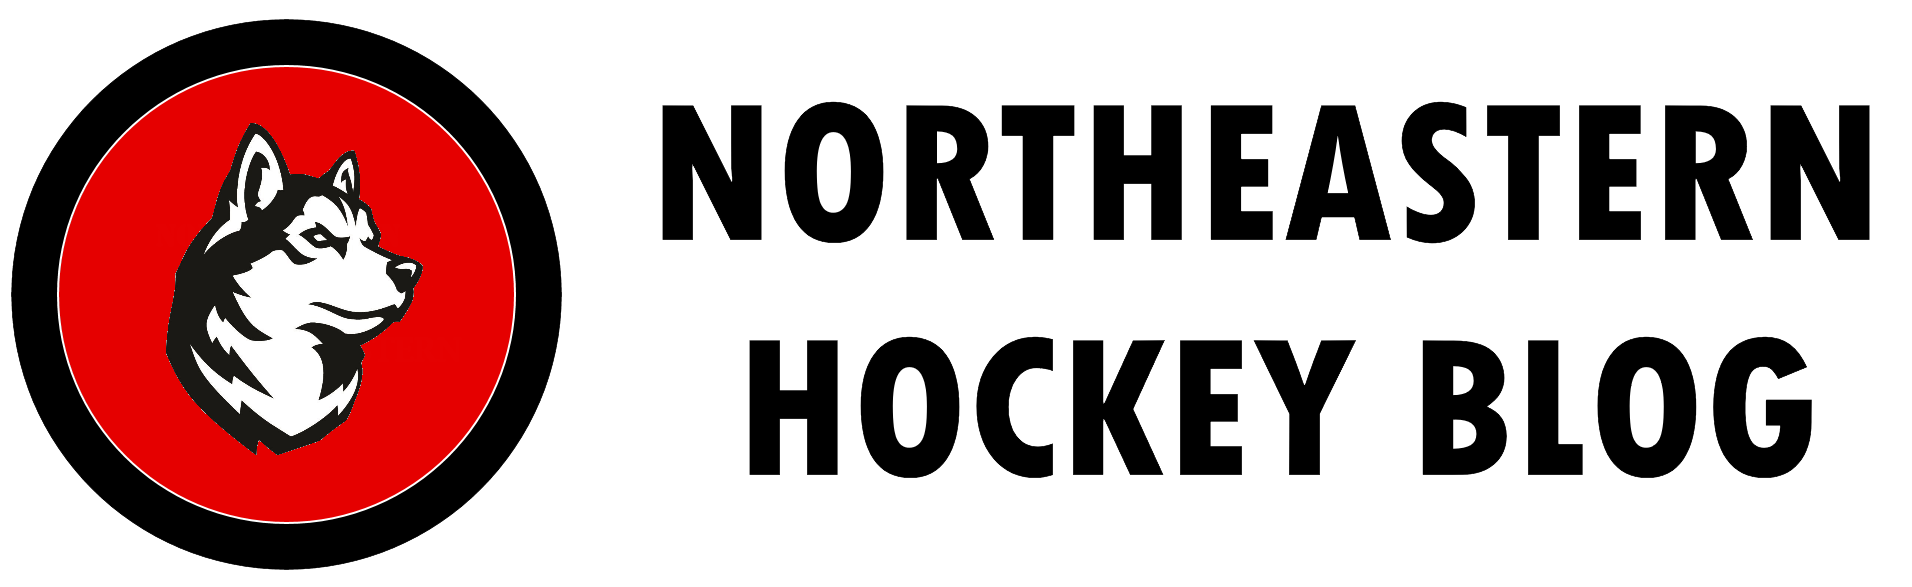 The Northeastern Hockey Blog